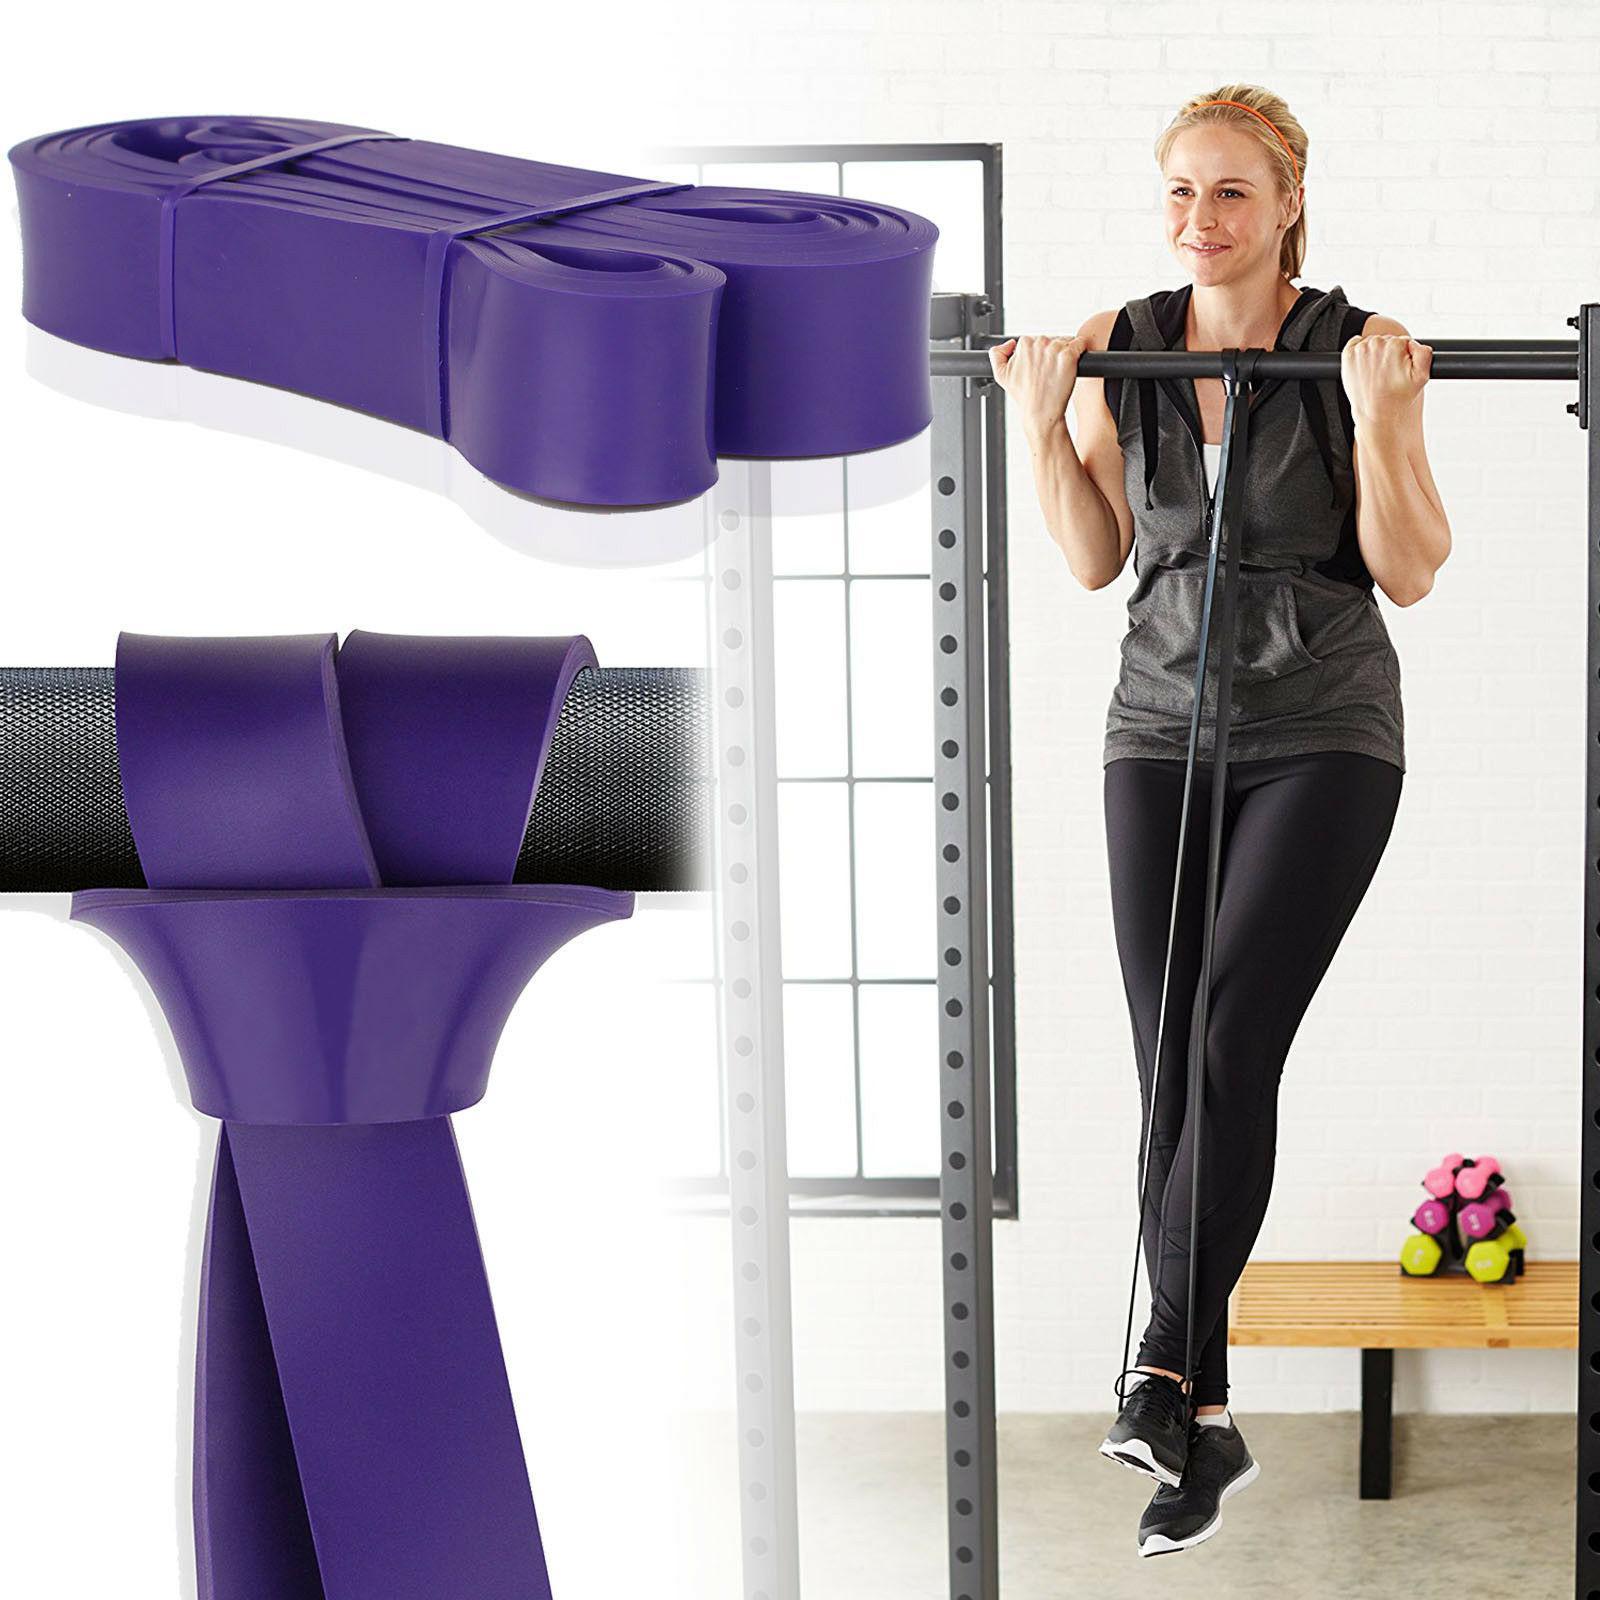 Resistance Bands men women - Exercise for yoga, mma, rehab